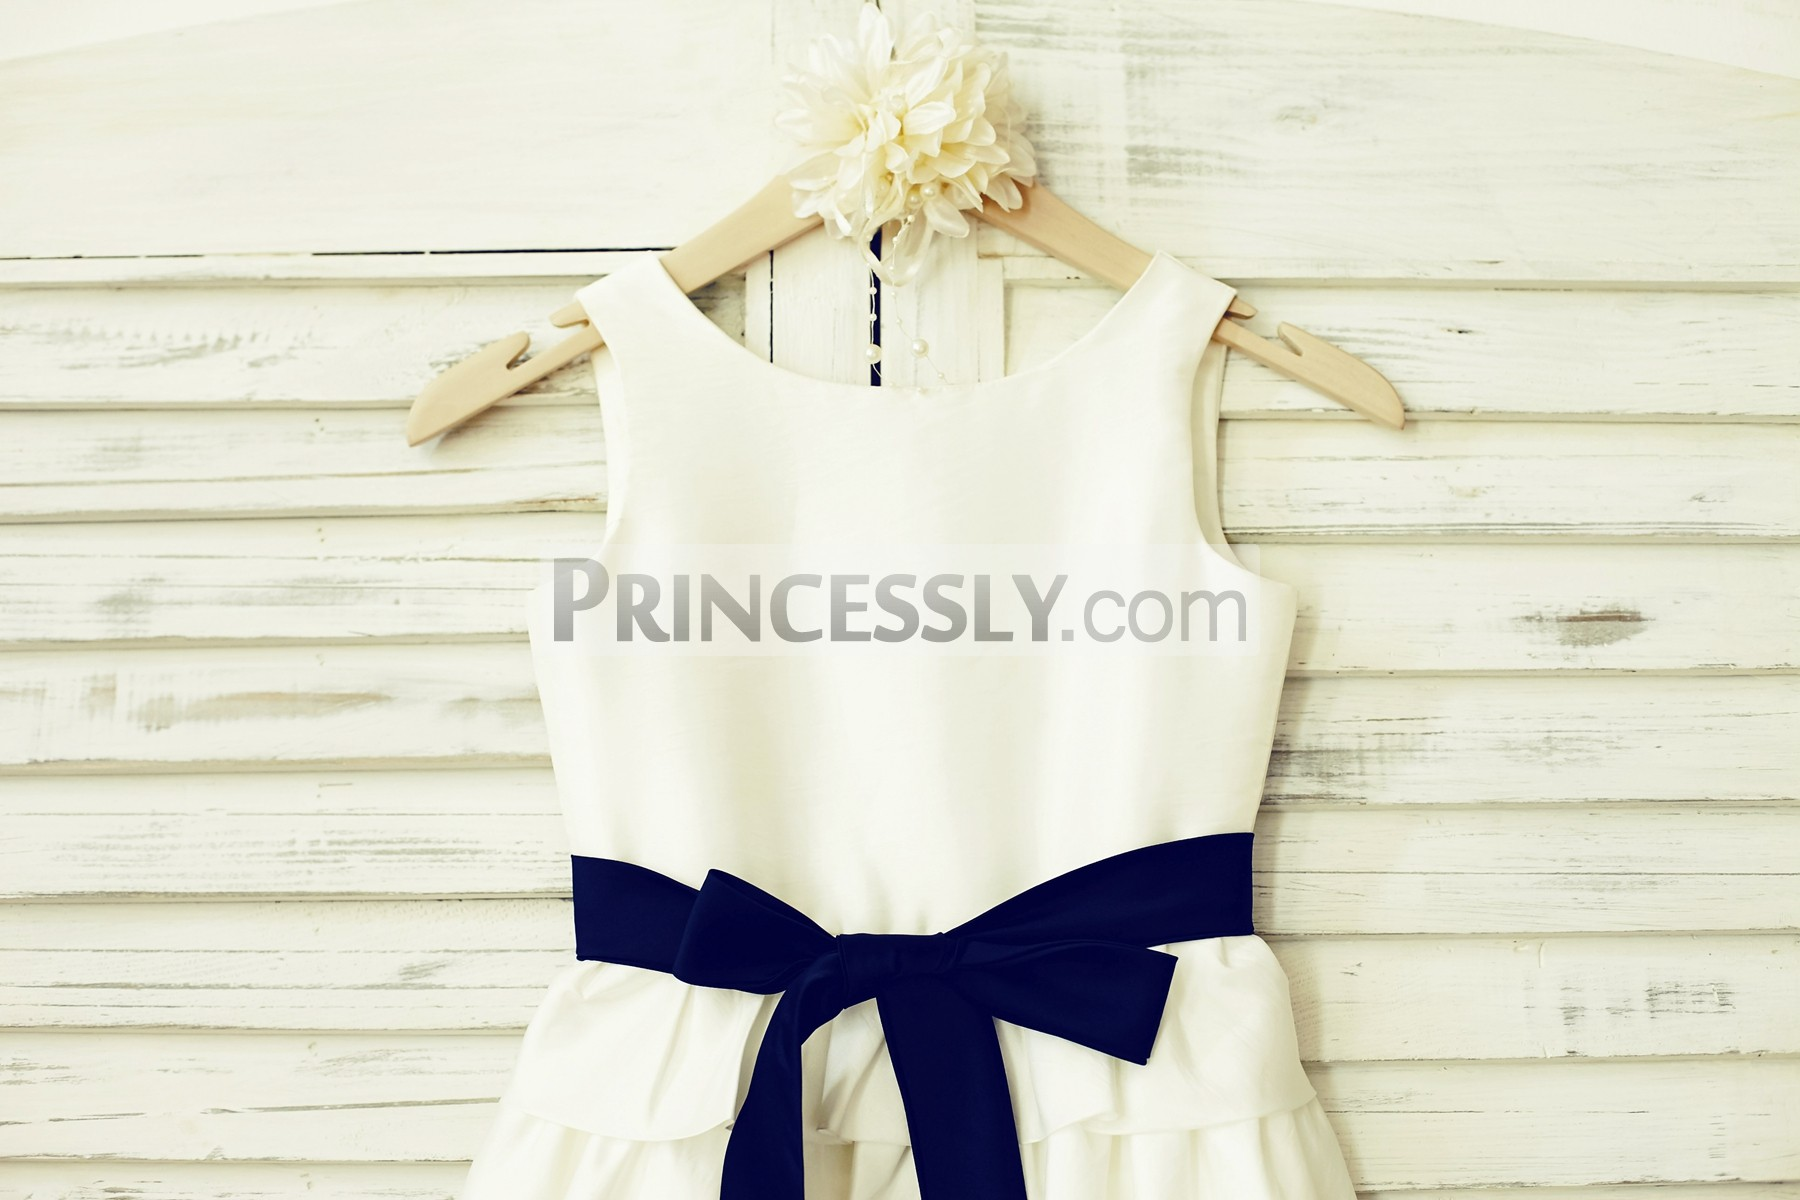 Scoop neck sleeveless bodice with navy blue sash